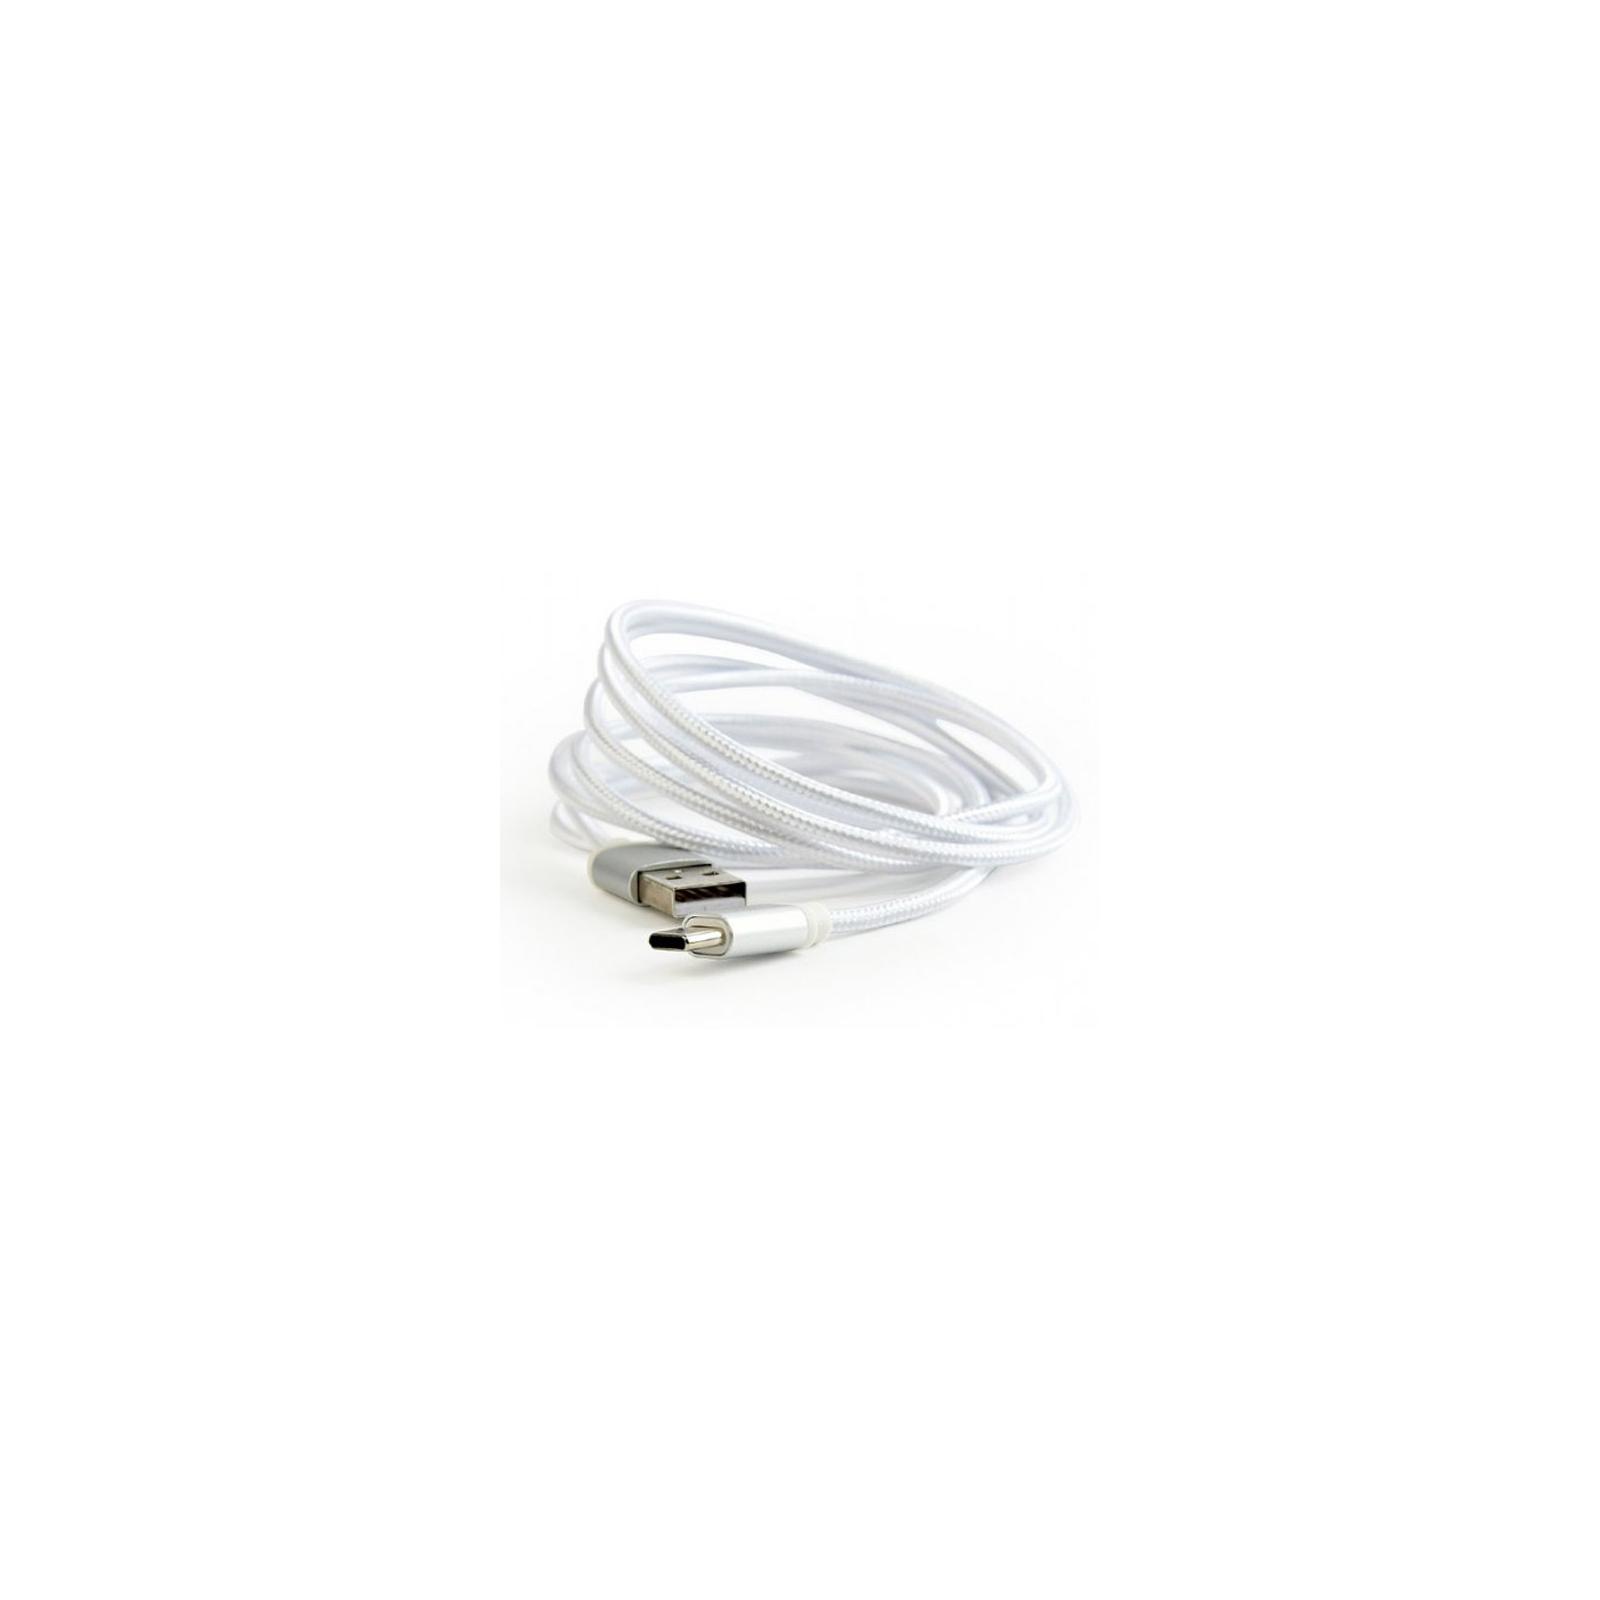 Дата кабель USB 2.0 AM to Type-C 1.0m Cablexpert (CCB-mUSB2B-AMCM-6-G)